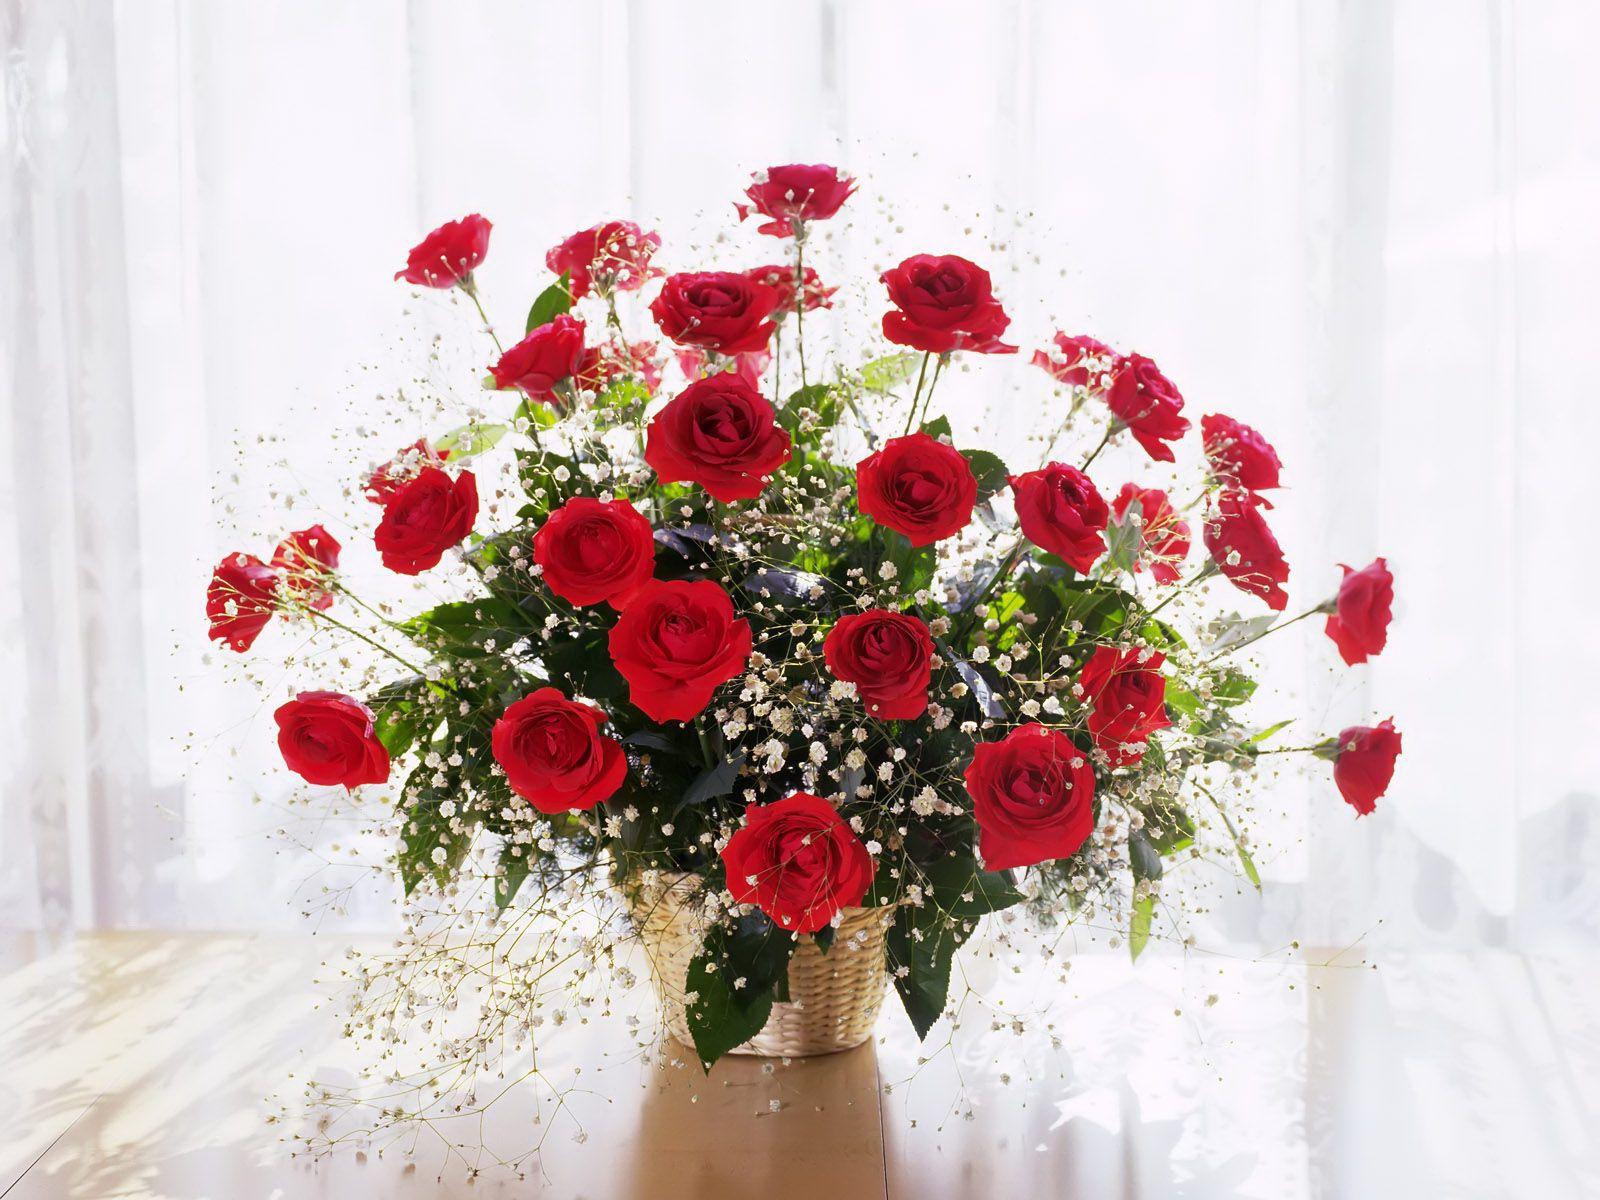 Фото букет цветов роз анимация